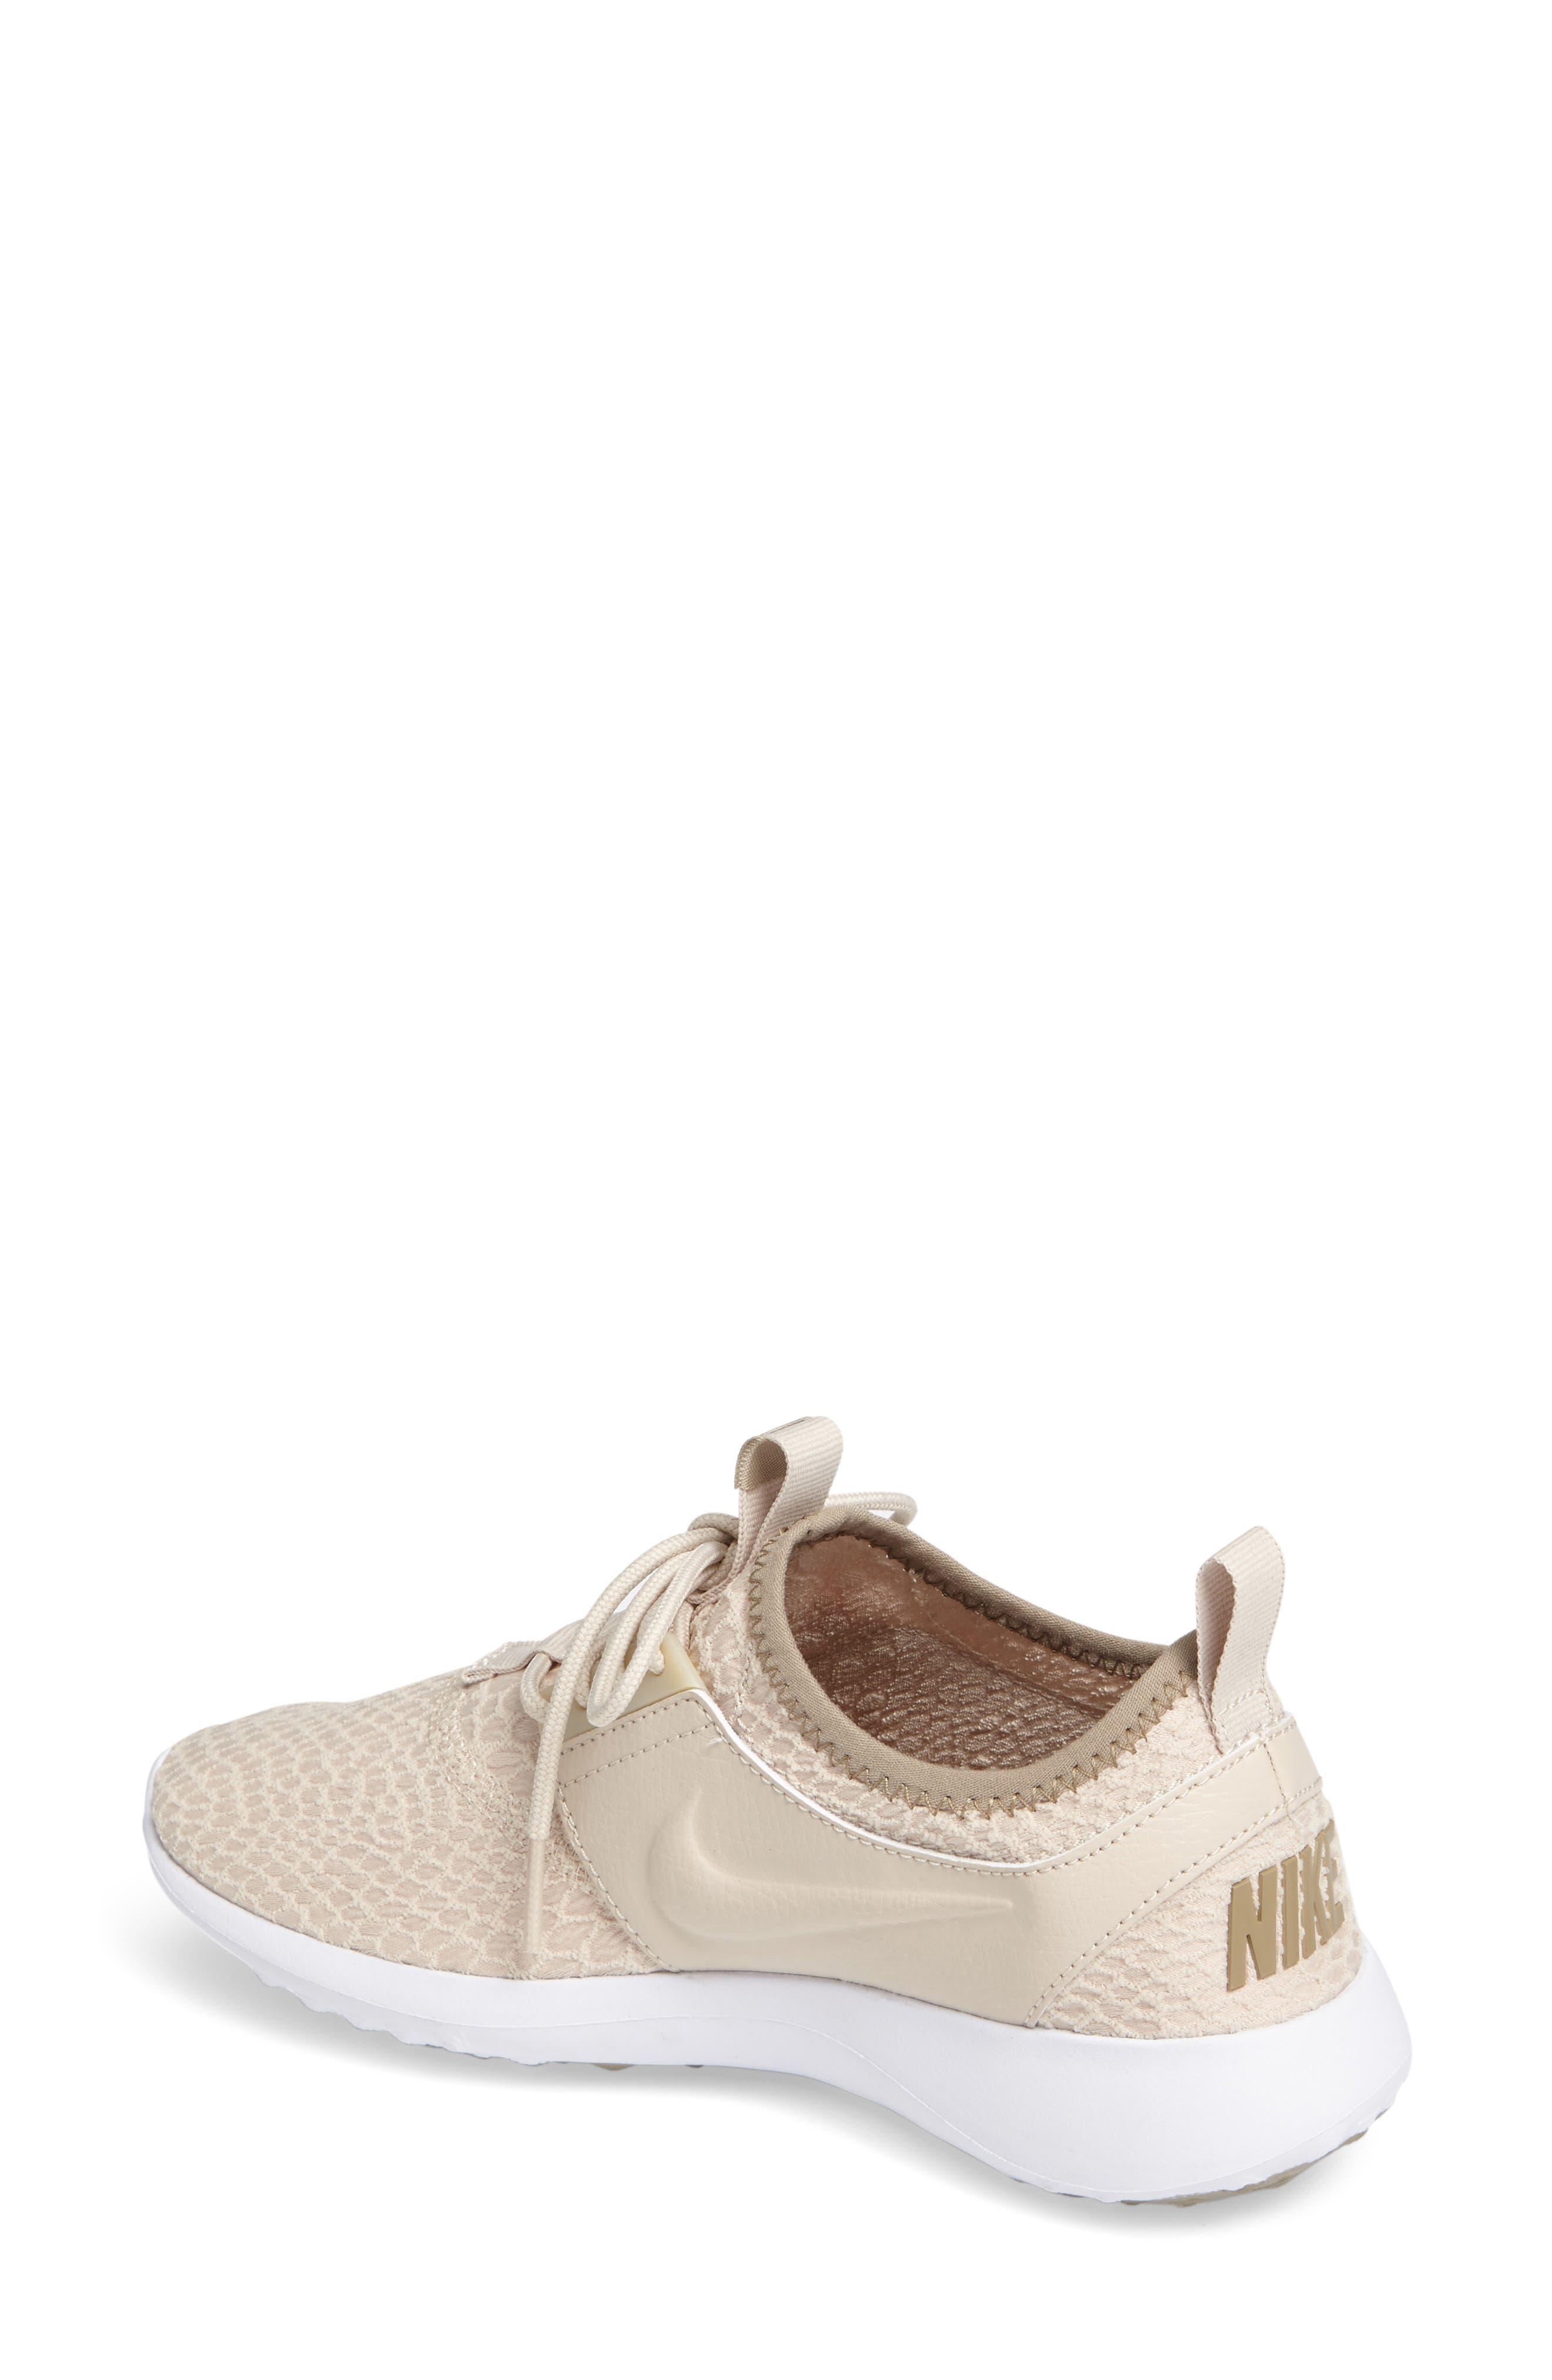 Juvenate SE Sneaker,                             Alternate thumbnail 20, color,